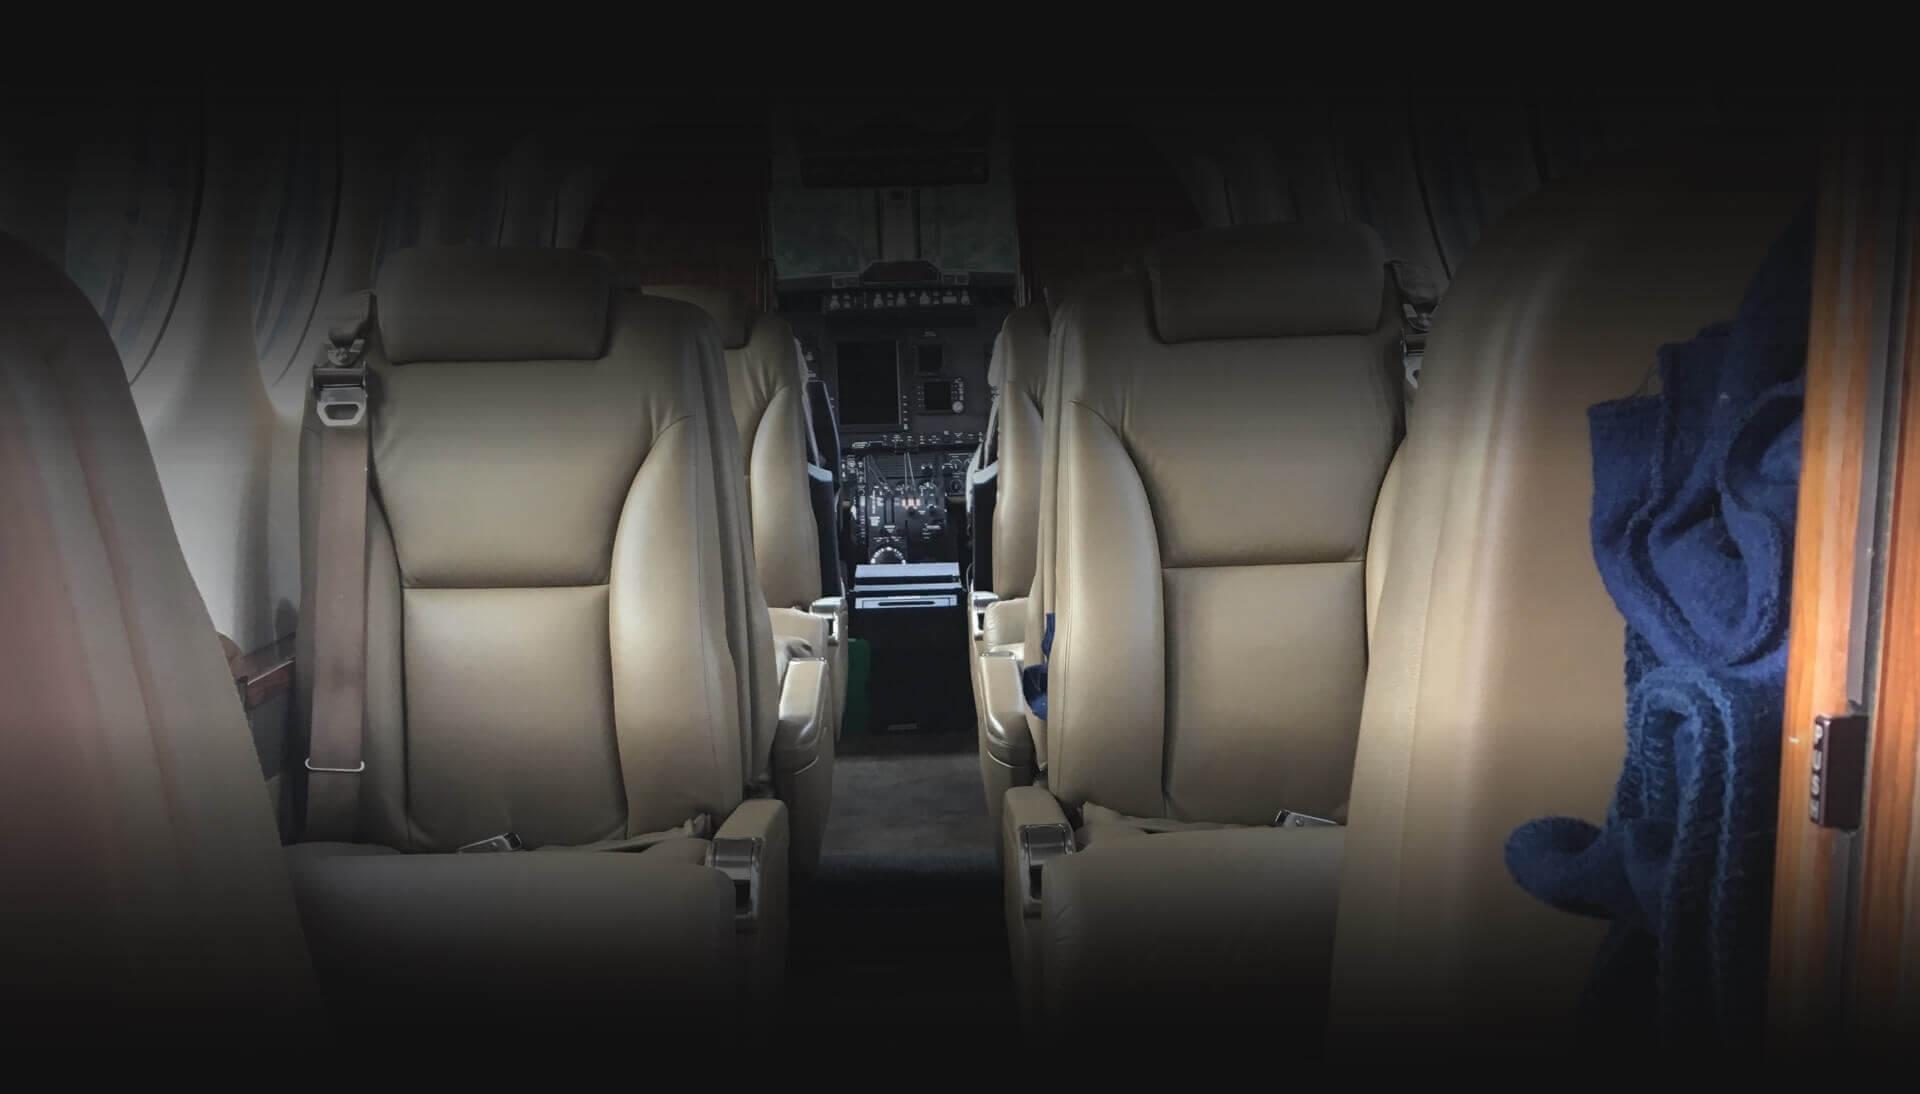 King Air 350 Aircraft Reservation